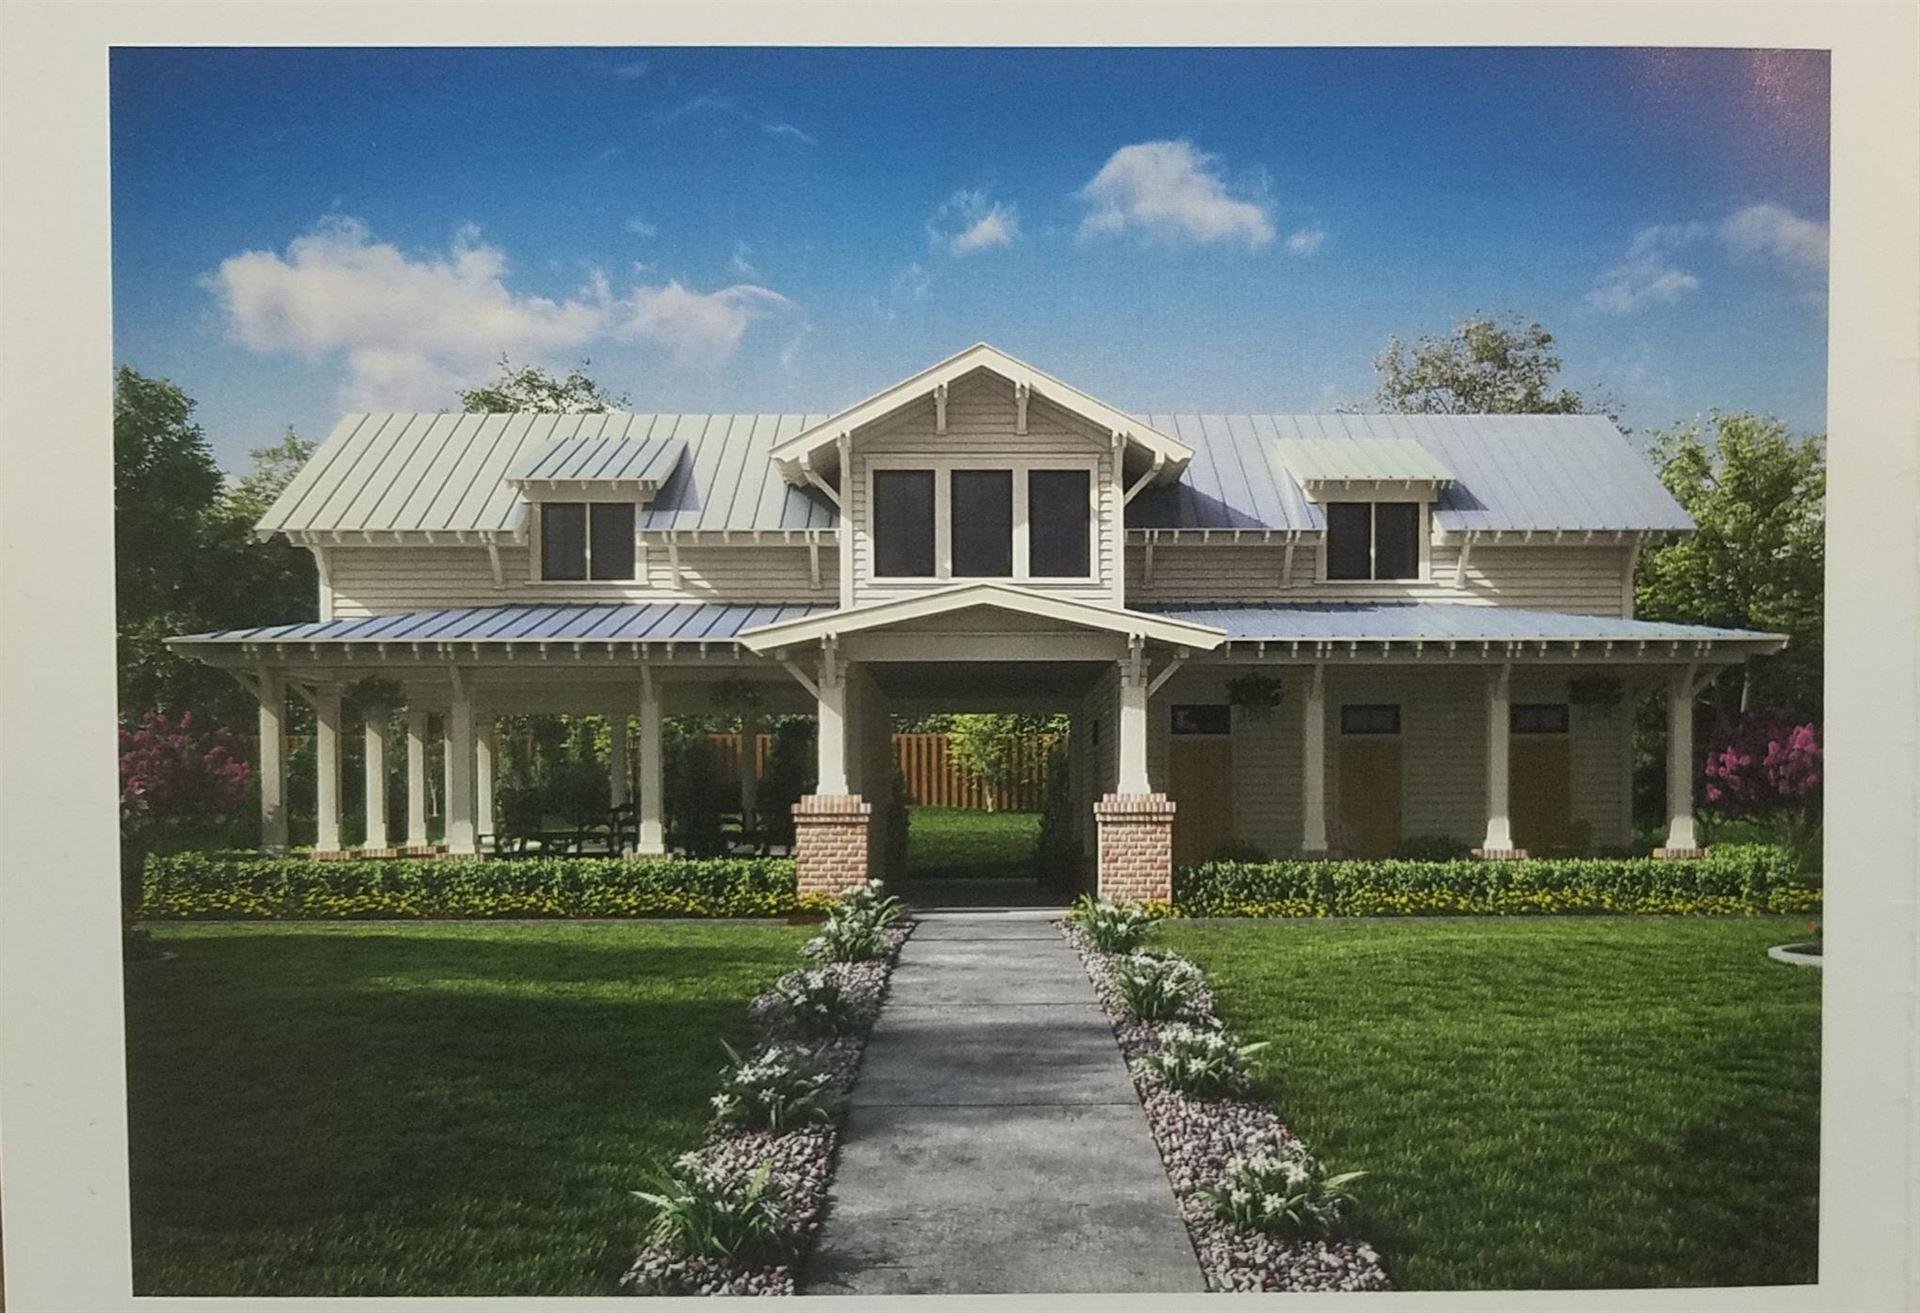 Photo of 609 Green Farm Way, Spring Hill, TN 37174 (MLS # 2090354)